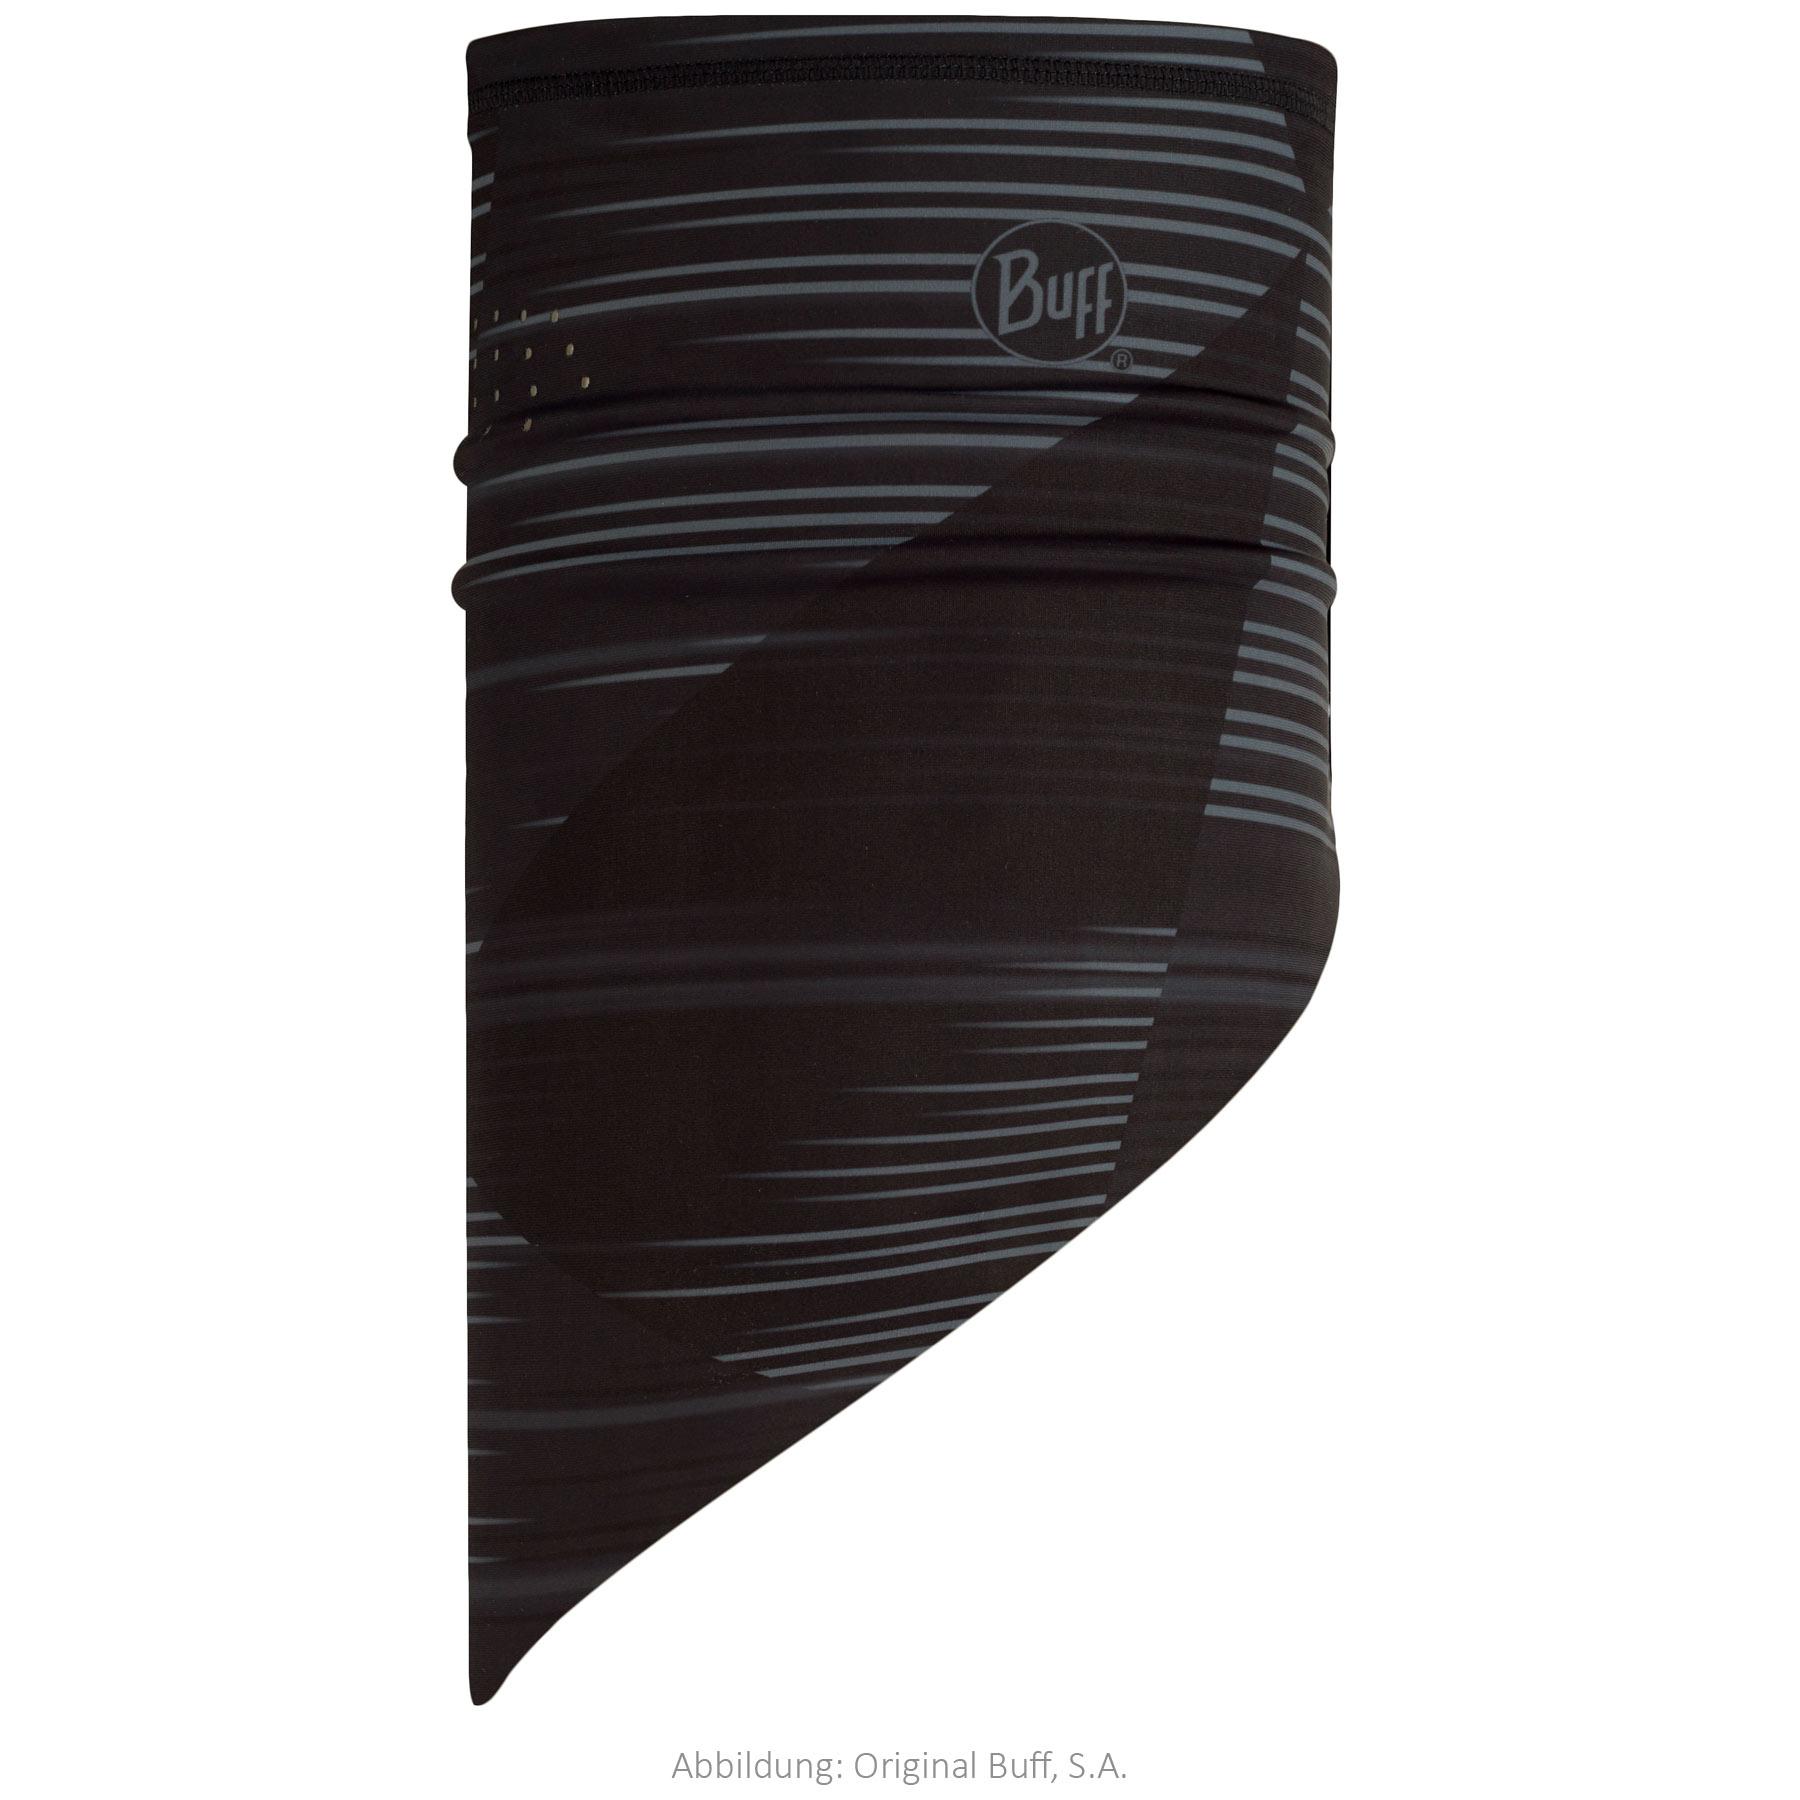 Image of Buff® Tech Fleece Bandana - Refik Black